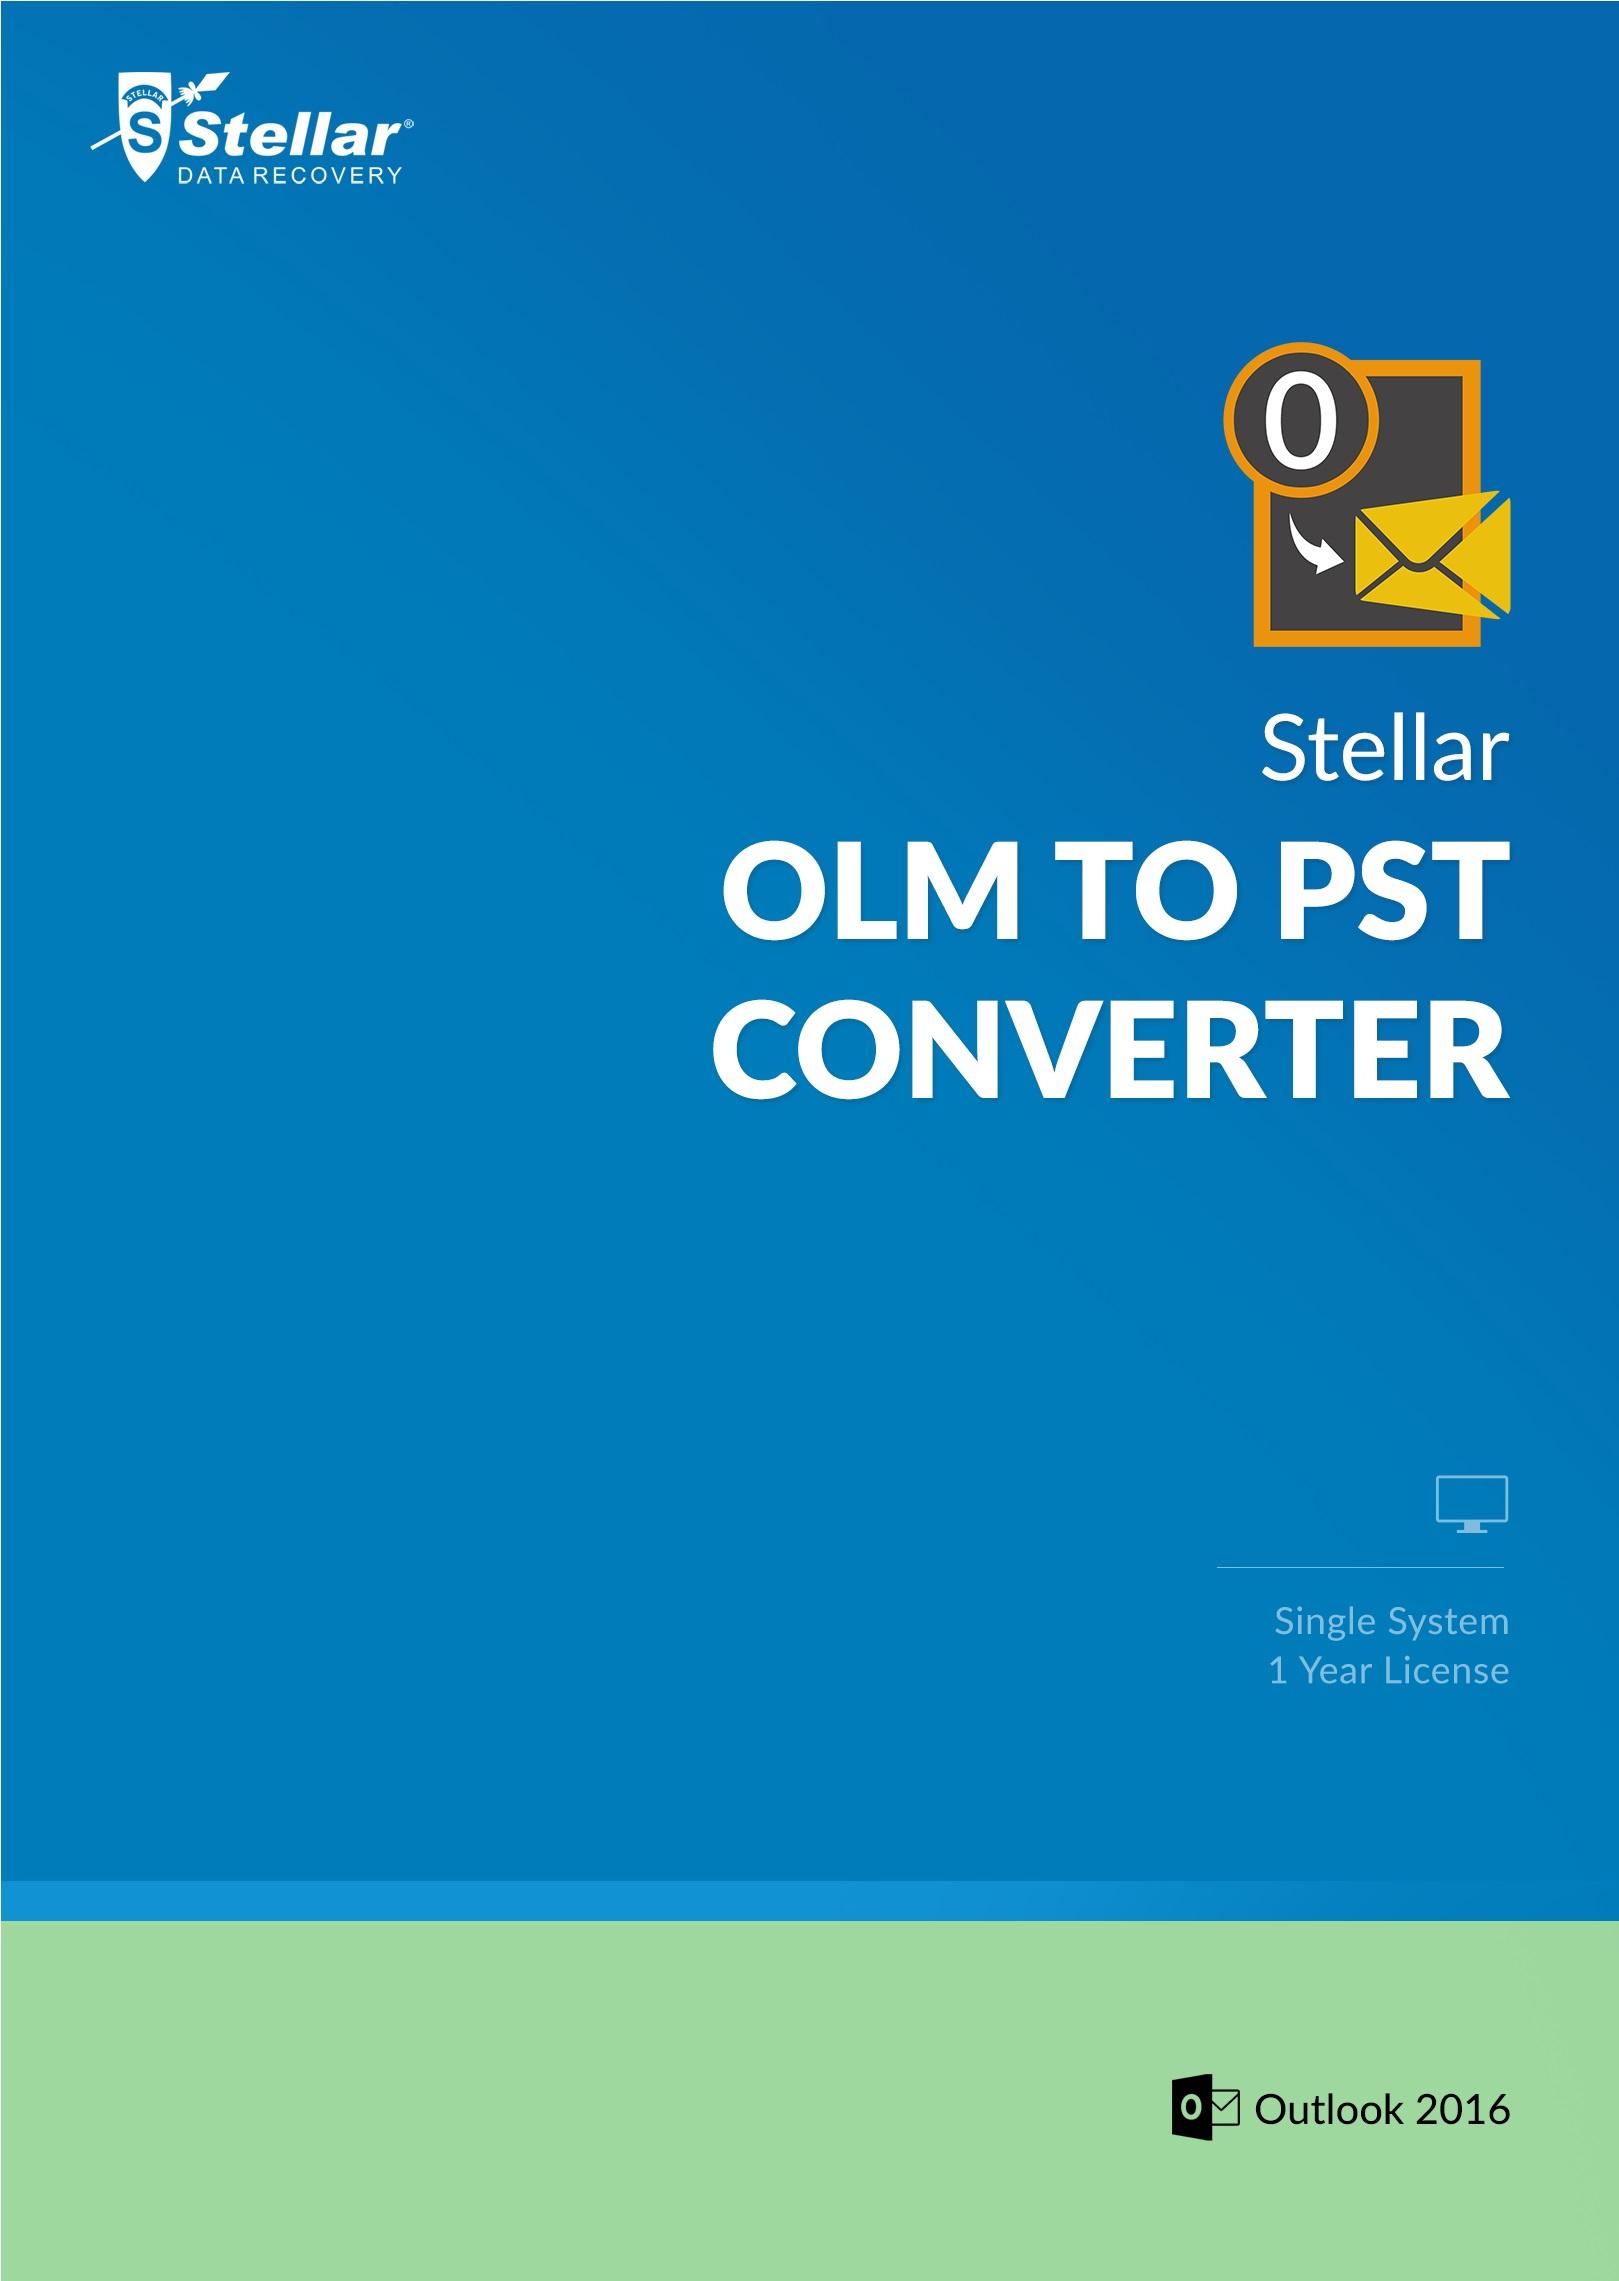 Stellar OLM to PST Converter [Download]